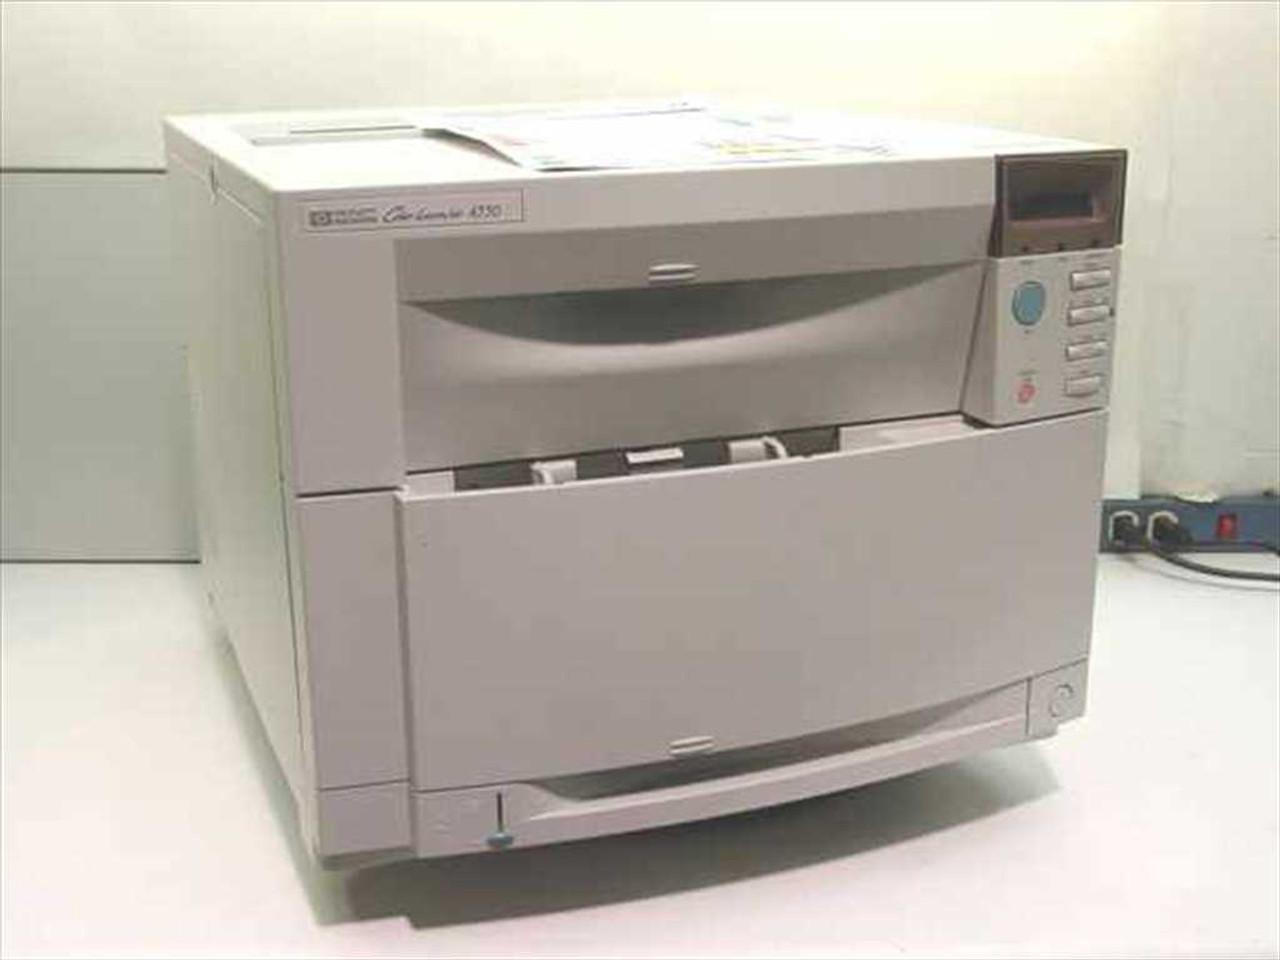 HP C7085A Color LaserJet 4550 Printer - As Is ...